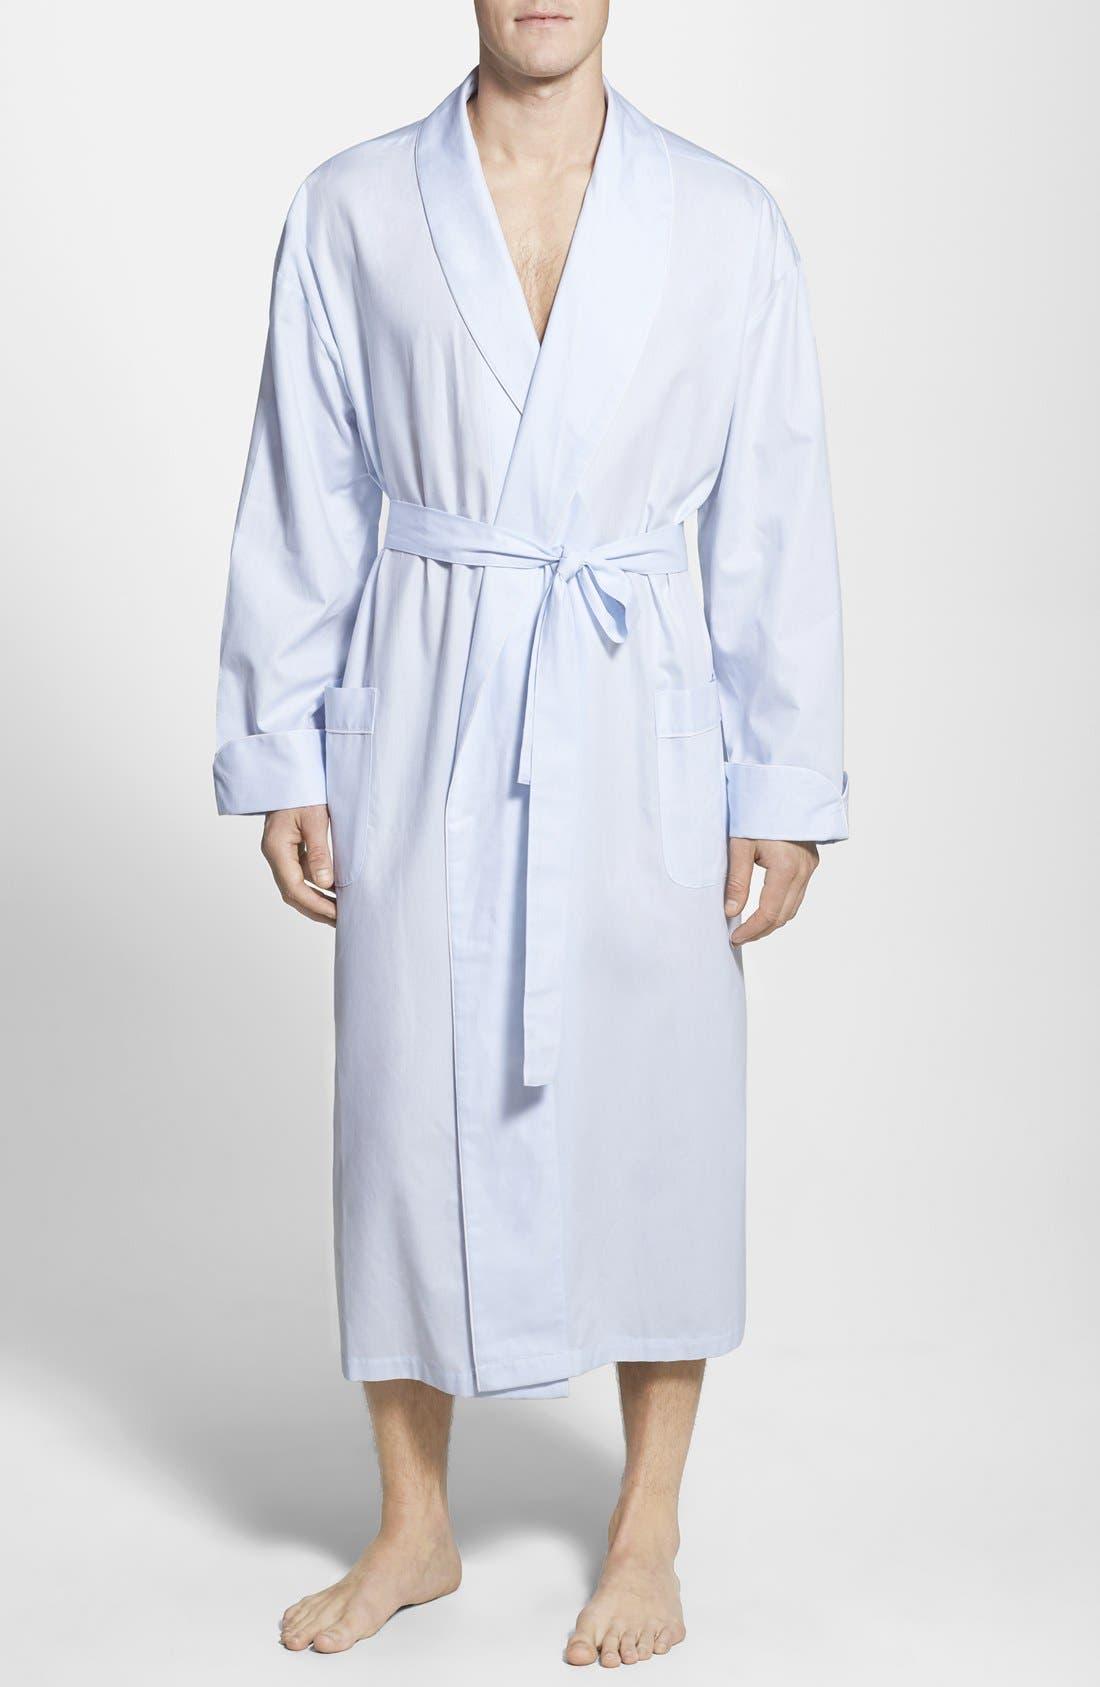 MAJESTIC INTERNATIONAL 'Signature' Cotton Robe, Main, color, SURF